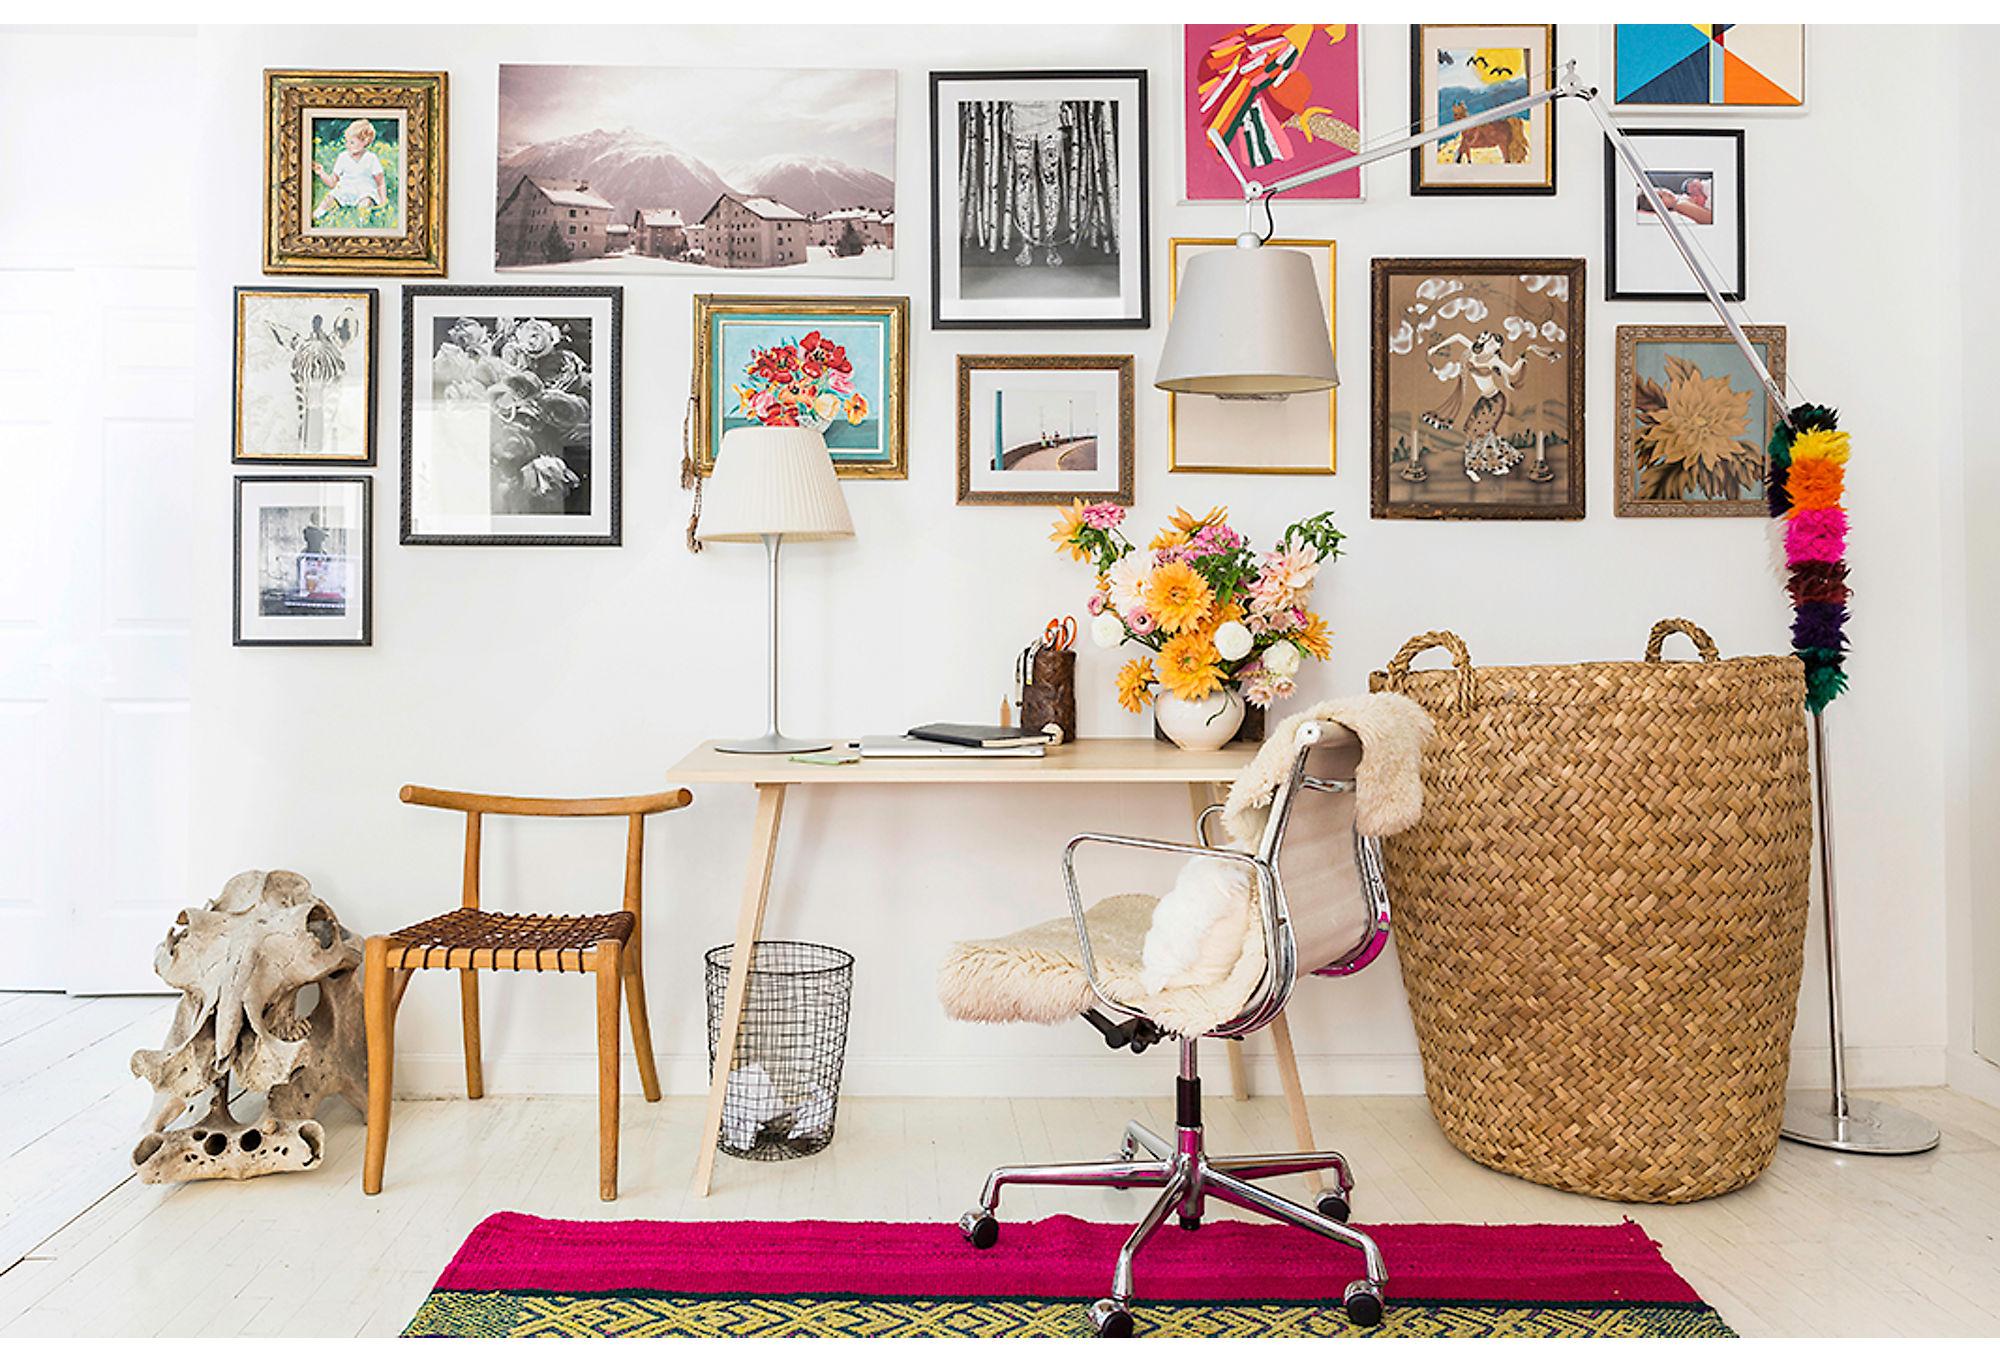 стена картины постеры рабочий стол кресло корзина